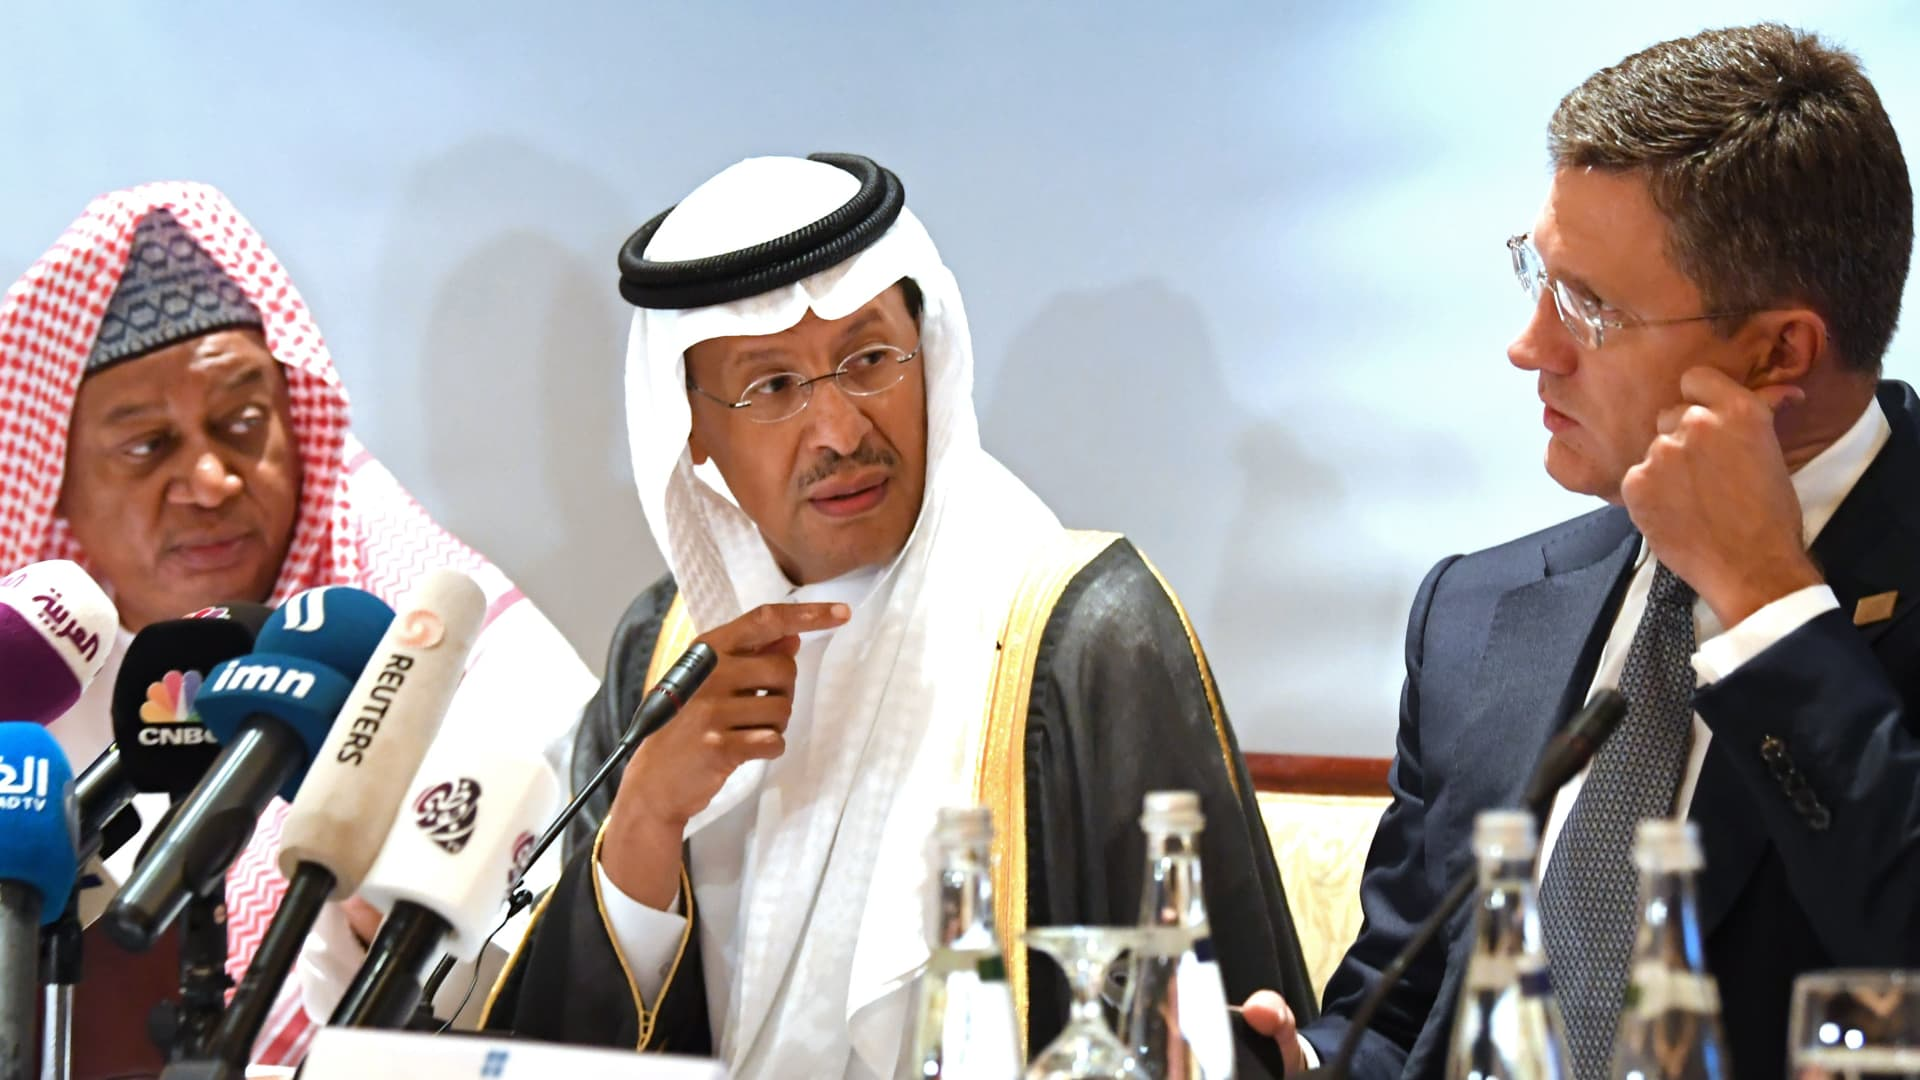 OPEC Secretary General Mohammed Sanusi Barkindo (L), Saudi Arabia's Energy Minister Prince Abdulaziz bin Salman (C) and Russian Energy Minister Alexander Novak (R) attend an Opec-JMMC meeting in the UAE capital Abu Dhabi on September 12, 2019.